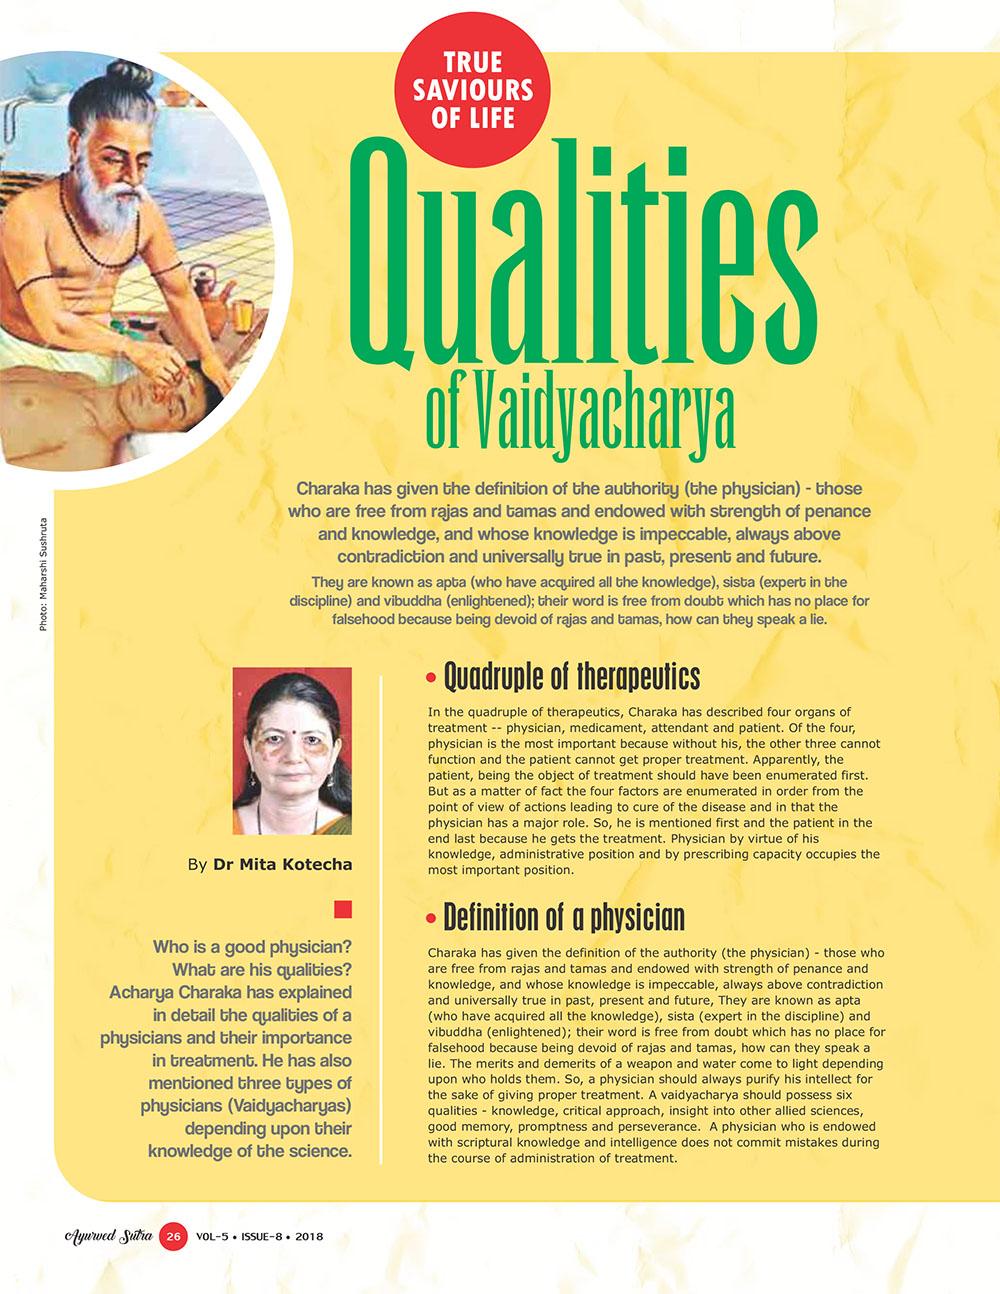 Ayurvedsutra Vol 05 issue 08 28 - Qualities of Vaidacharyas